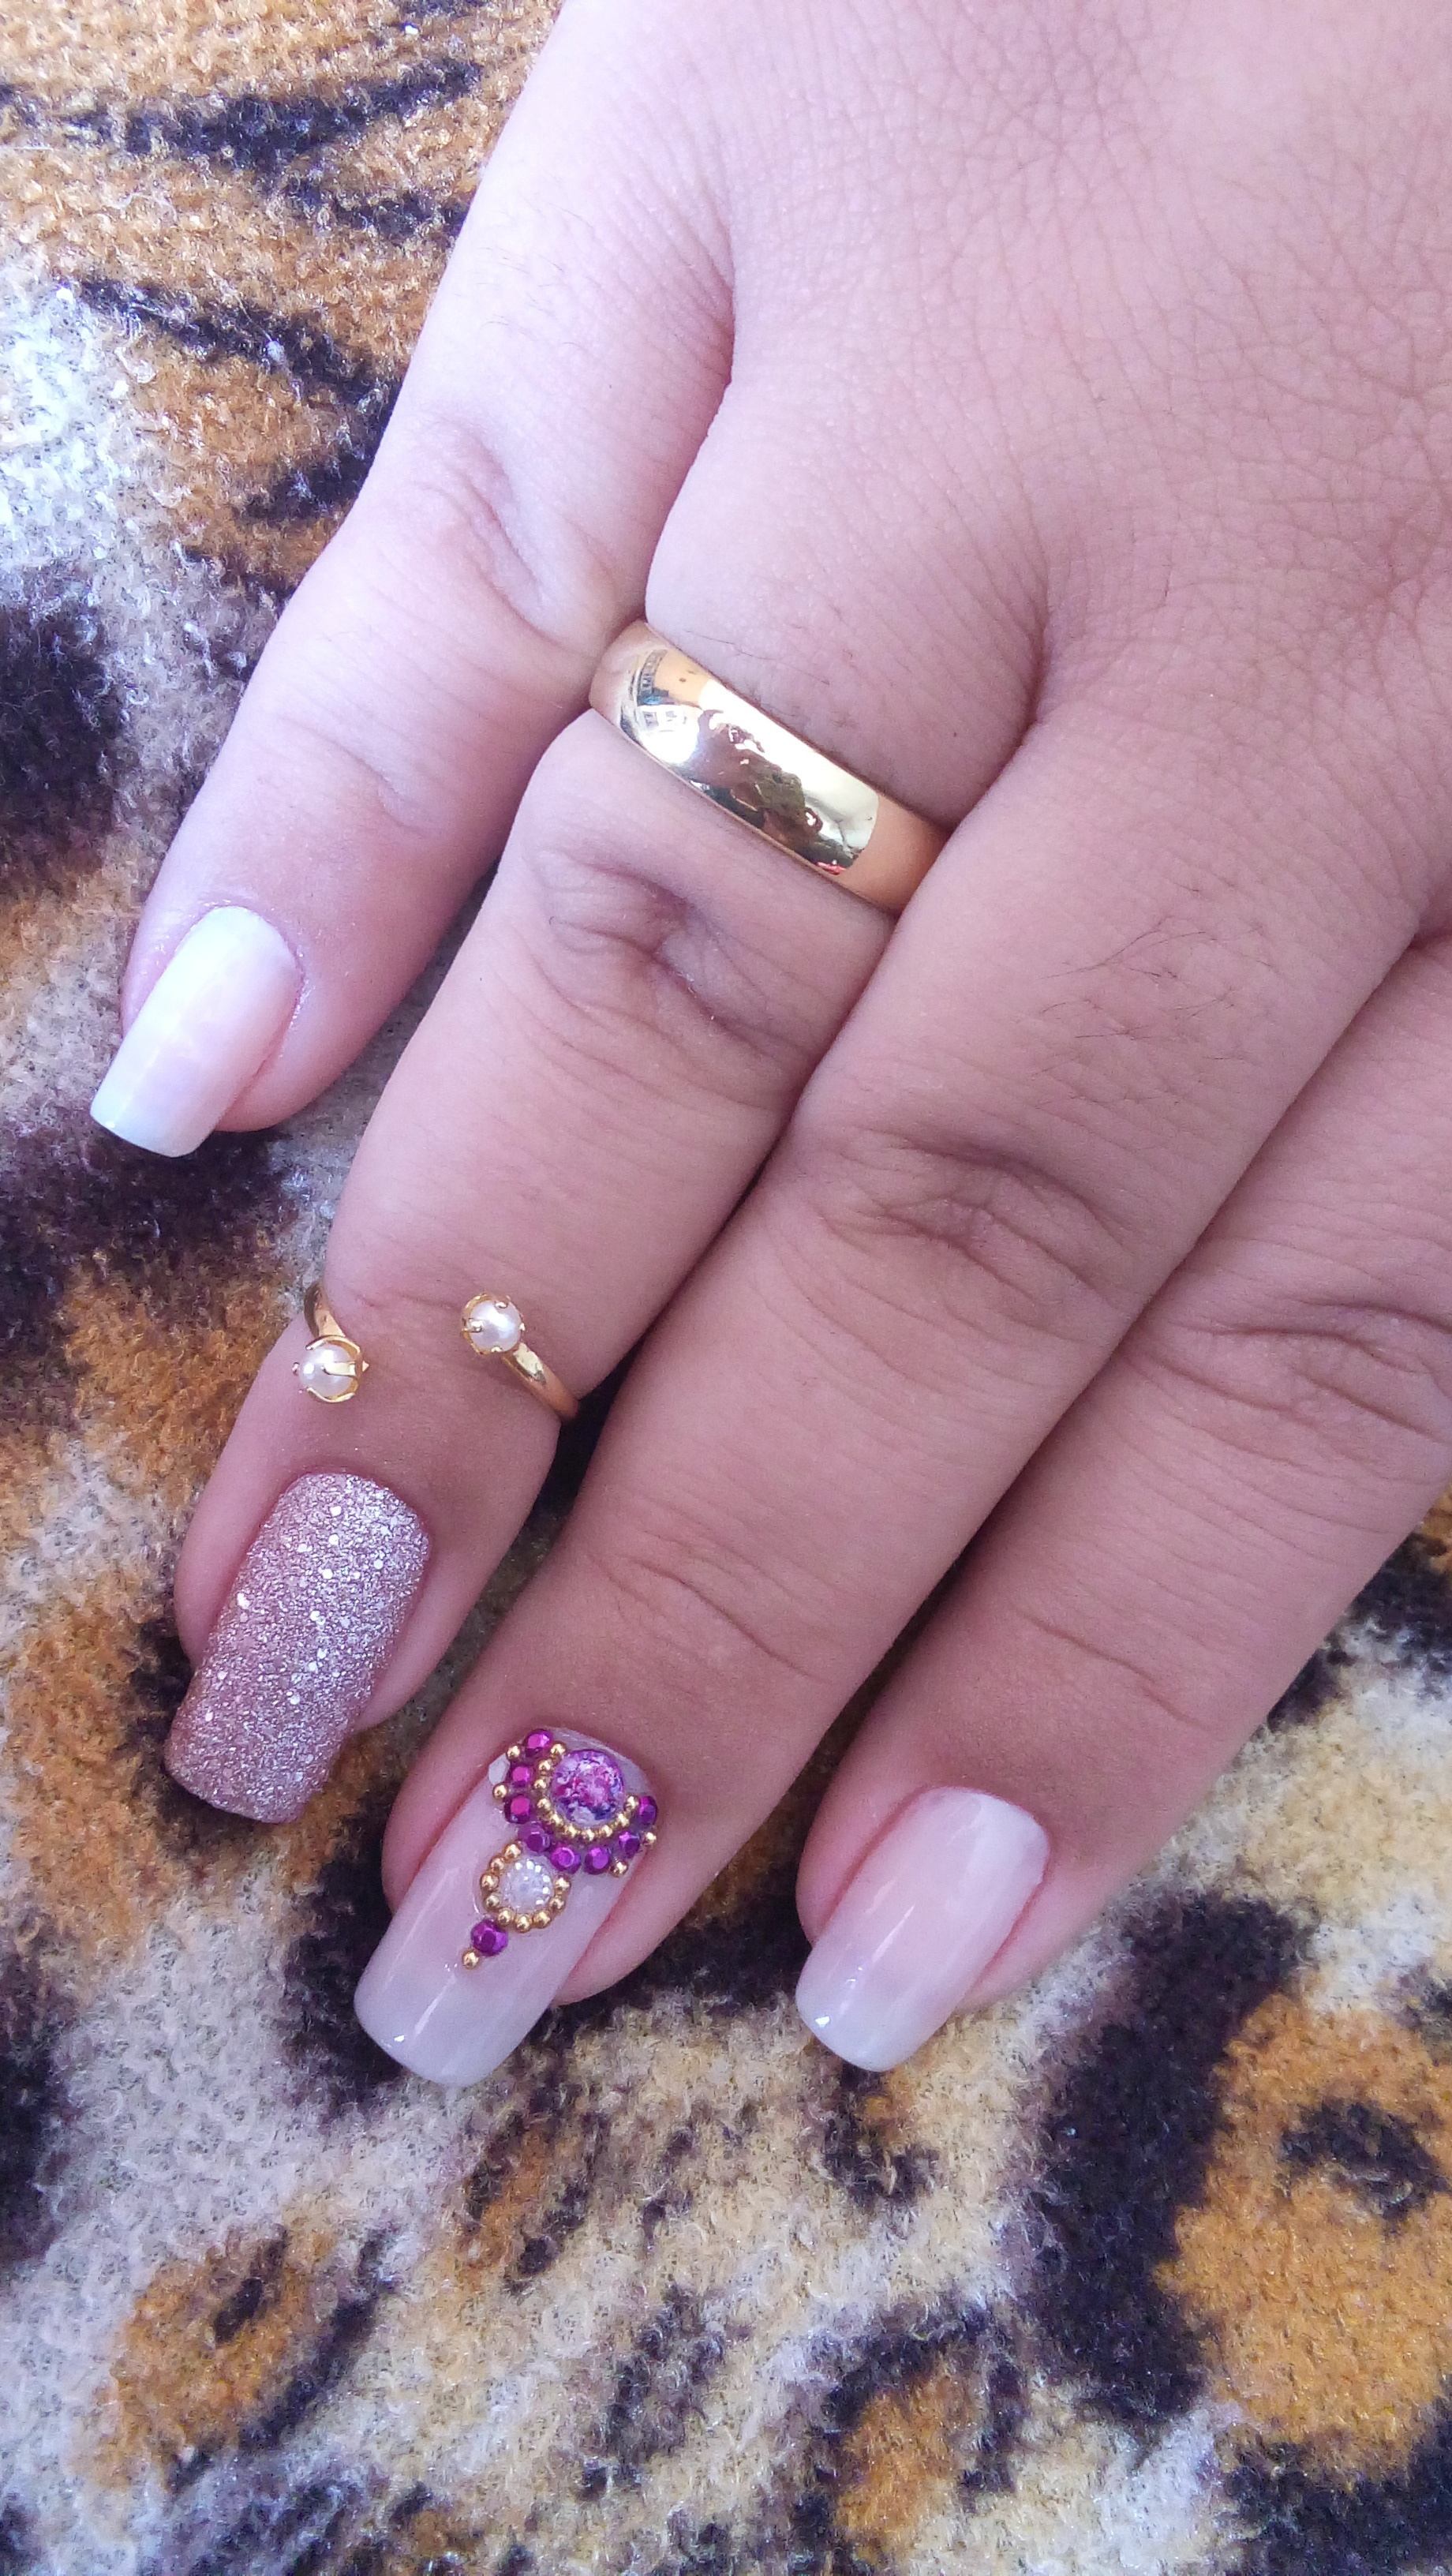 #nails #glitter  #diva #luxury #myjob #unhas #universofeminino #beleza #brilho #nails #nailsart #unhasdecoradas #unhas #unhasdediva #myjob #manicure #naildesign #lovenails unha manicure e pedicure